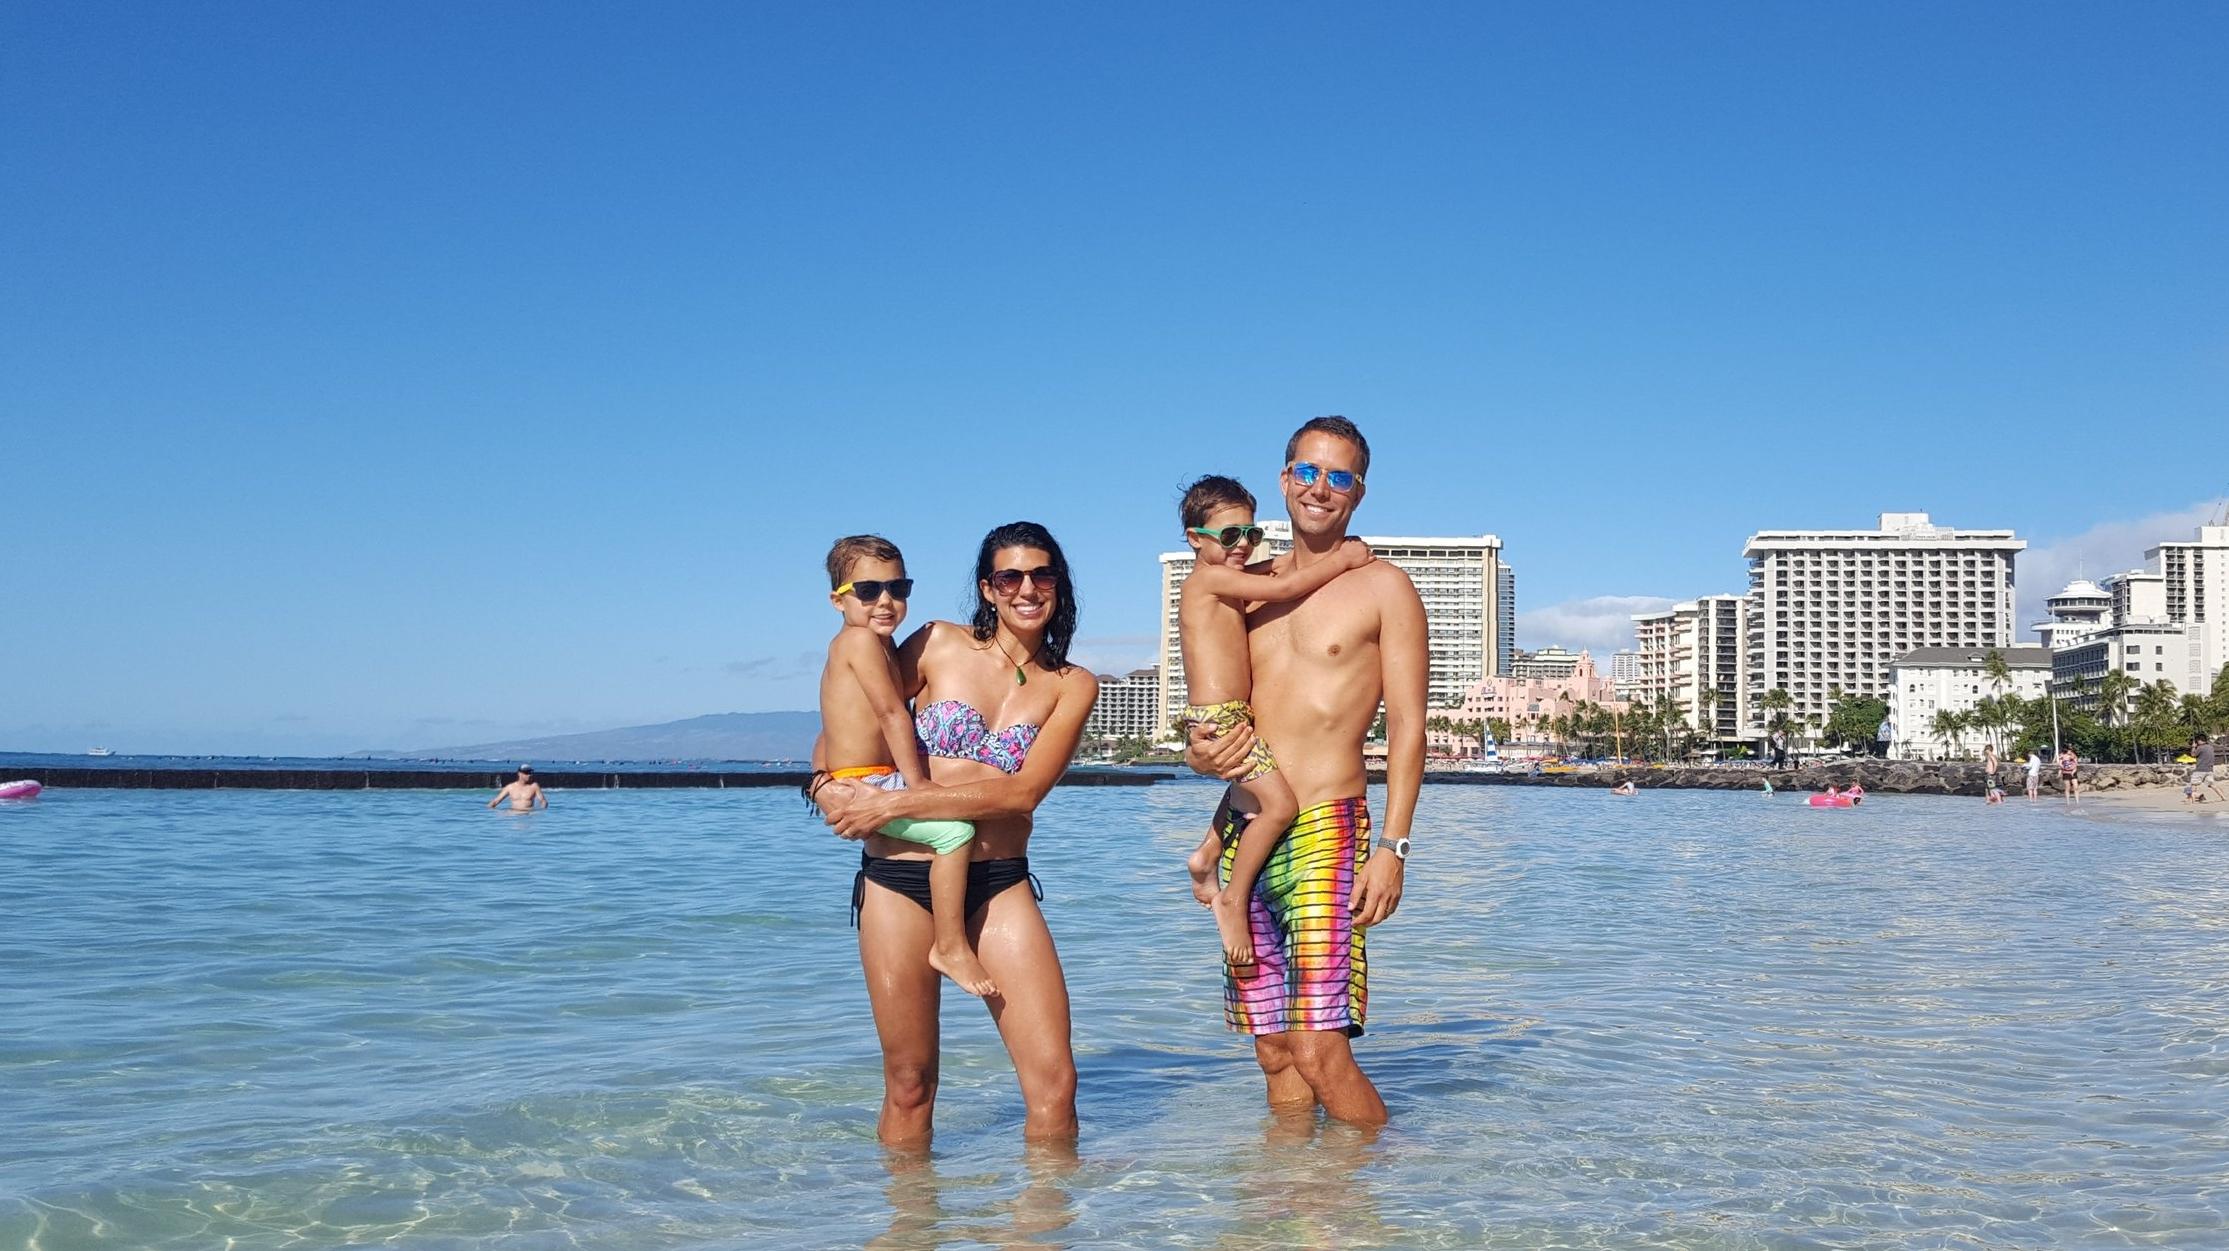 Waikiki Beach - Reid, Lindsay, Bennett, and Chip